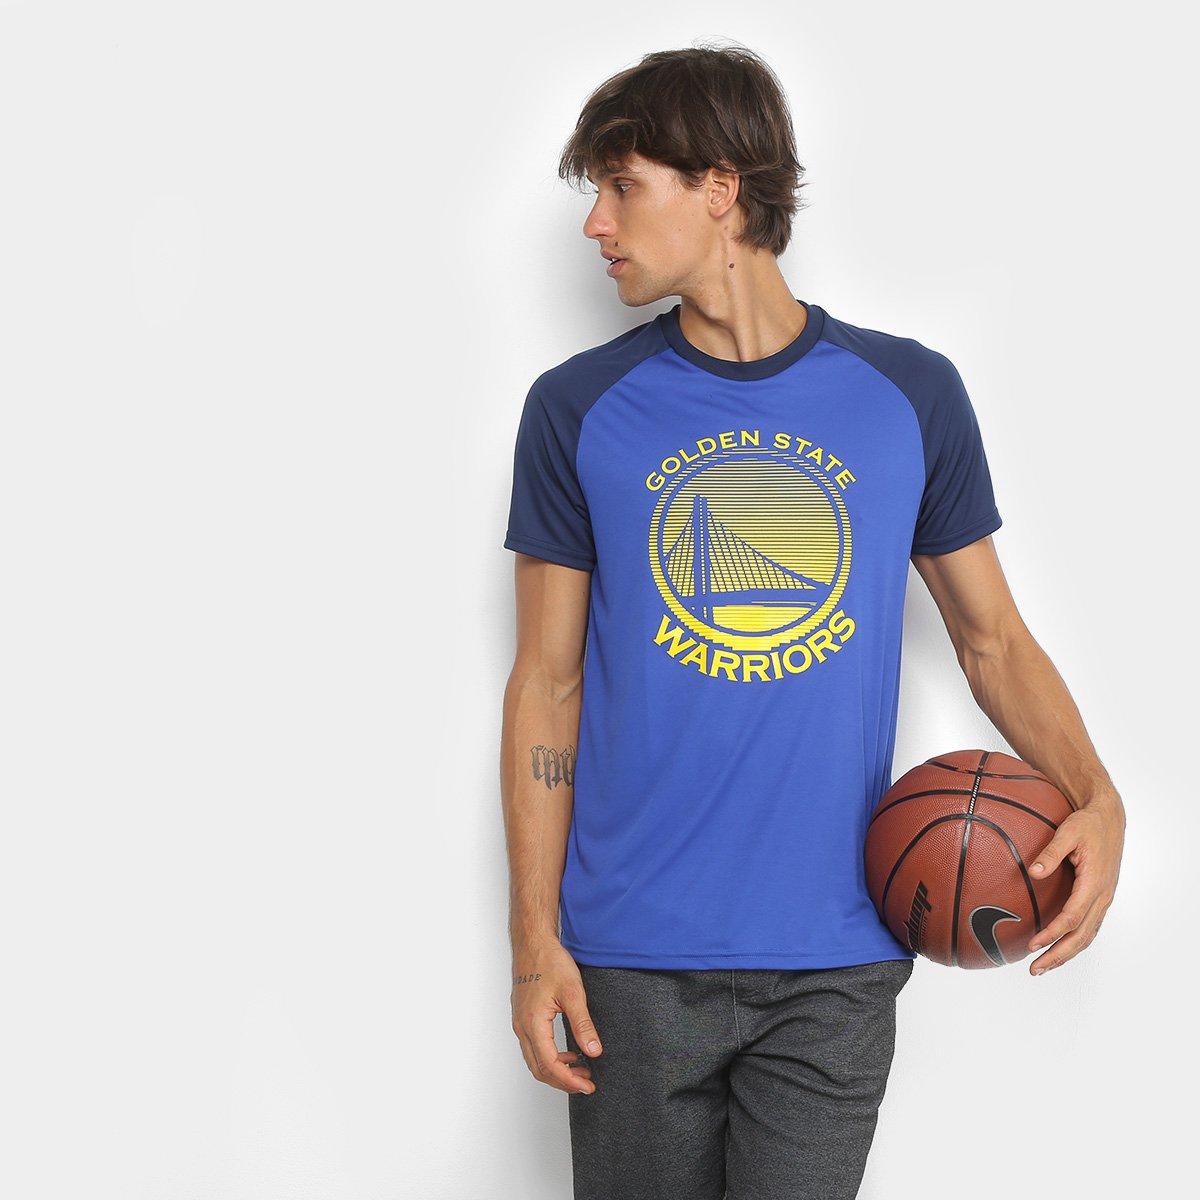 Camiseta NBA Golden State Warriors Masculina - Azul Royal - Compre ... 82f3836c3d7